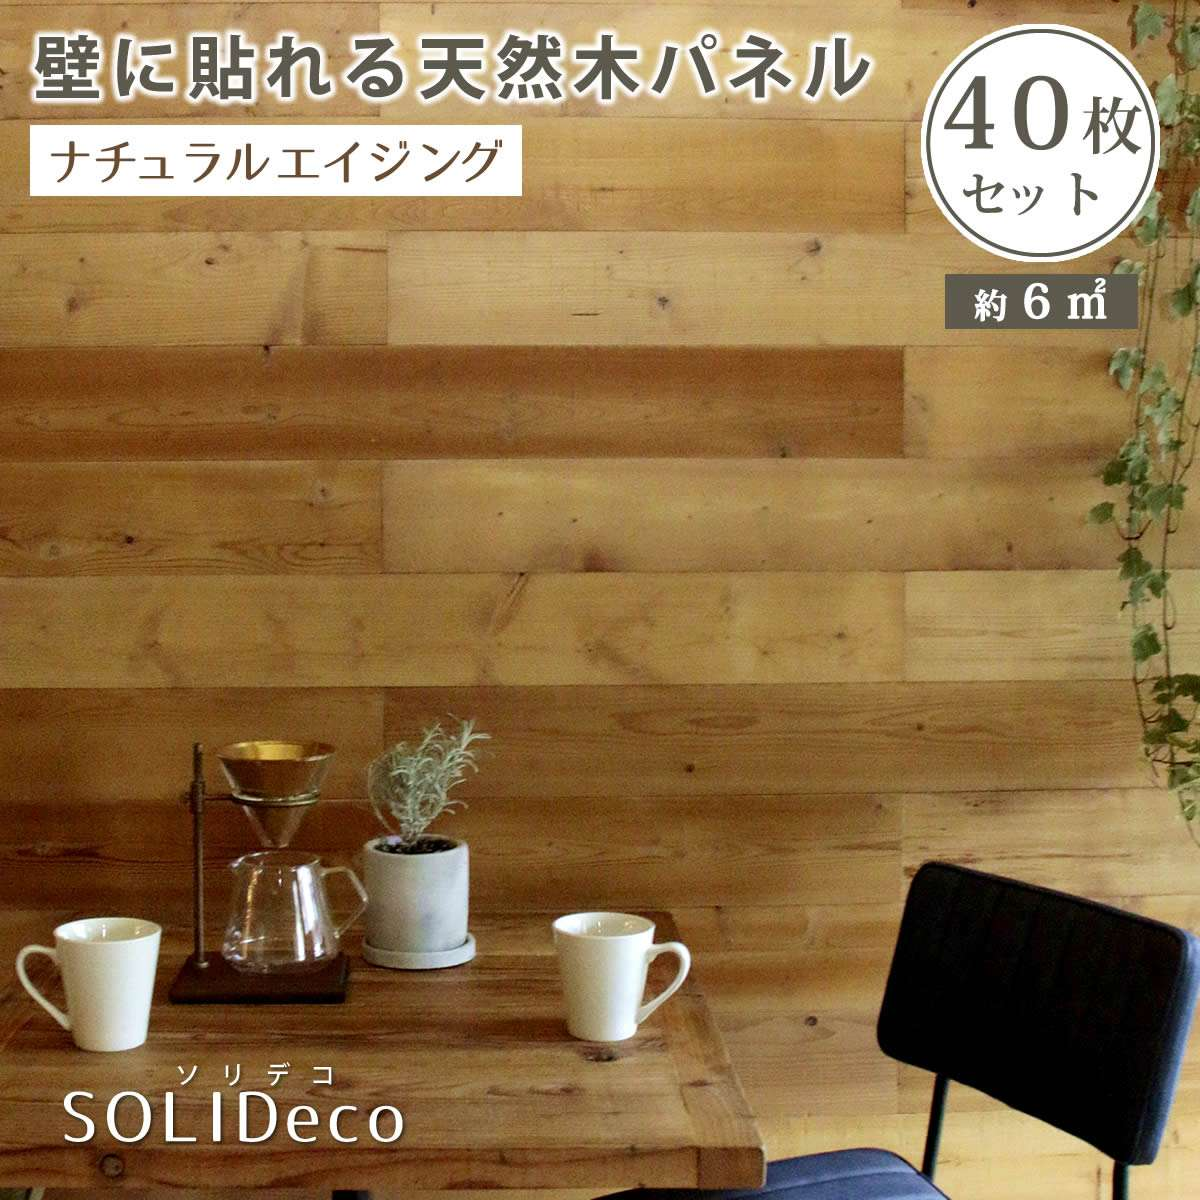 SOLIDECO 壁に貼れる天然木パネル 40枚組(約6m2) SLDC-40P-002AGE【壁パネル ウォールパネル ウッドパネル DIY 壁紙】:あいる 店